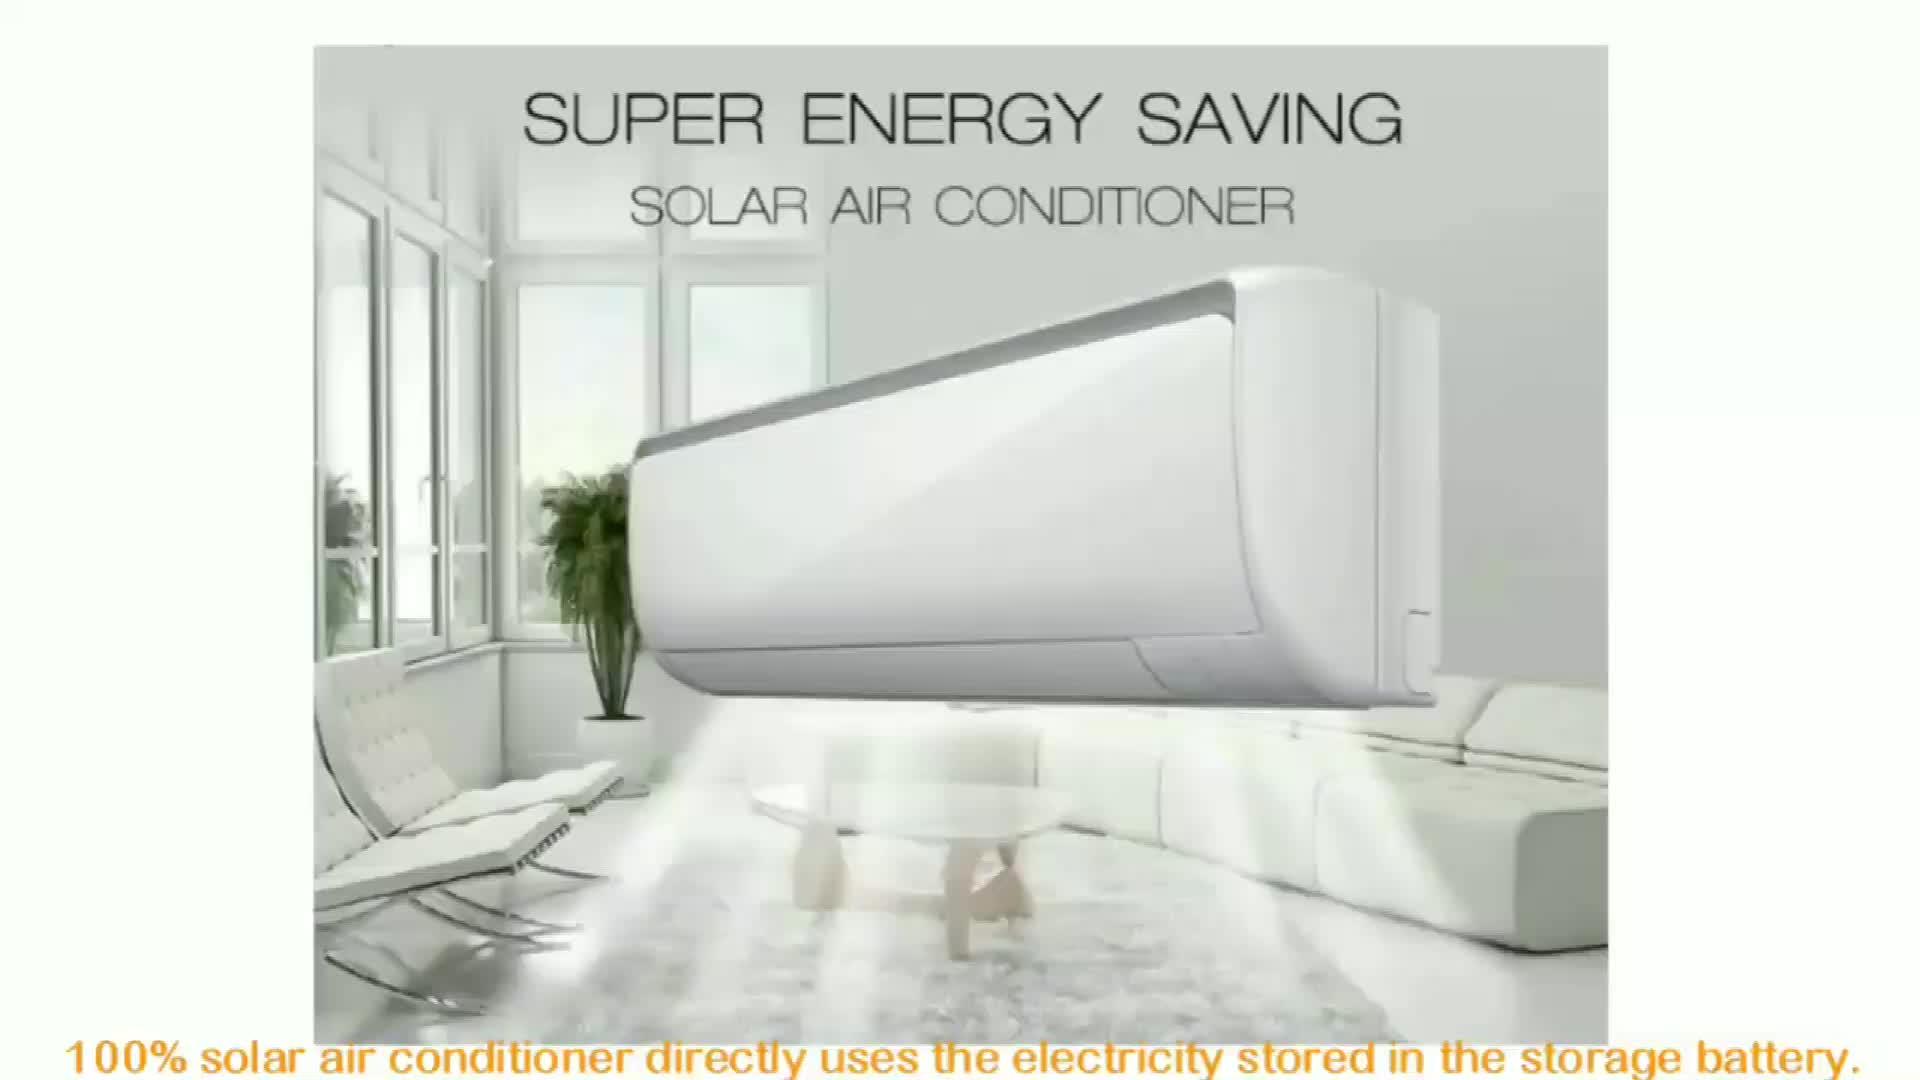 35 GW 12000btu 100% DC48V พลังงานแสงอาทิตย์ Air Conditioner ที่มีแผงพลังงานแสงอาทิตย์และแบตเตอรี่